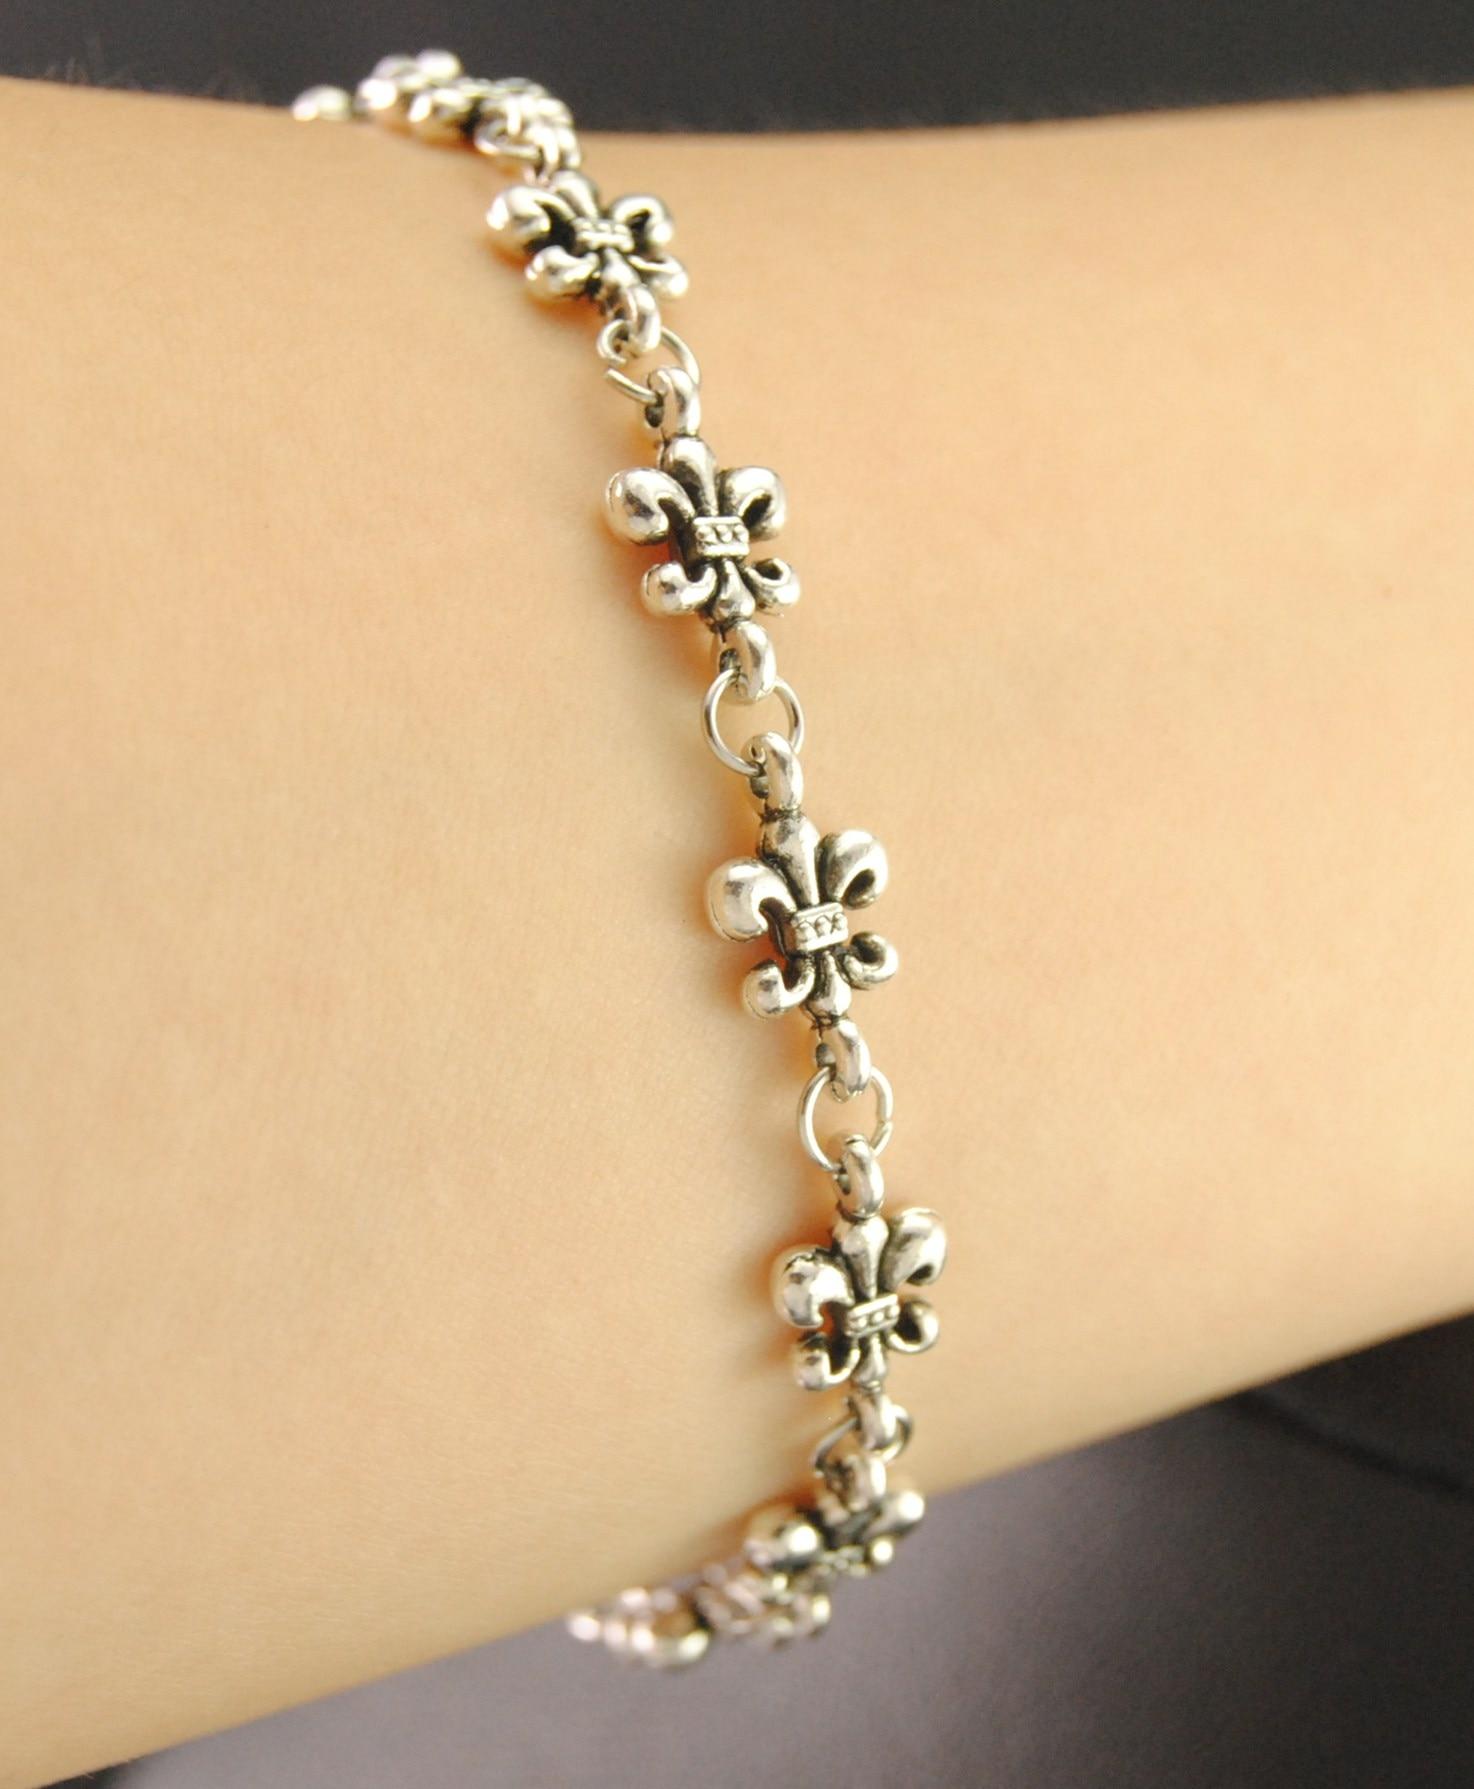 Tibetan Silver Zinc Alloy French Lily Fleur De Lis Lotus Moon Charm Chain Link Bracelet Adjustable Jewlery Accessories